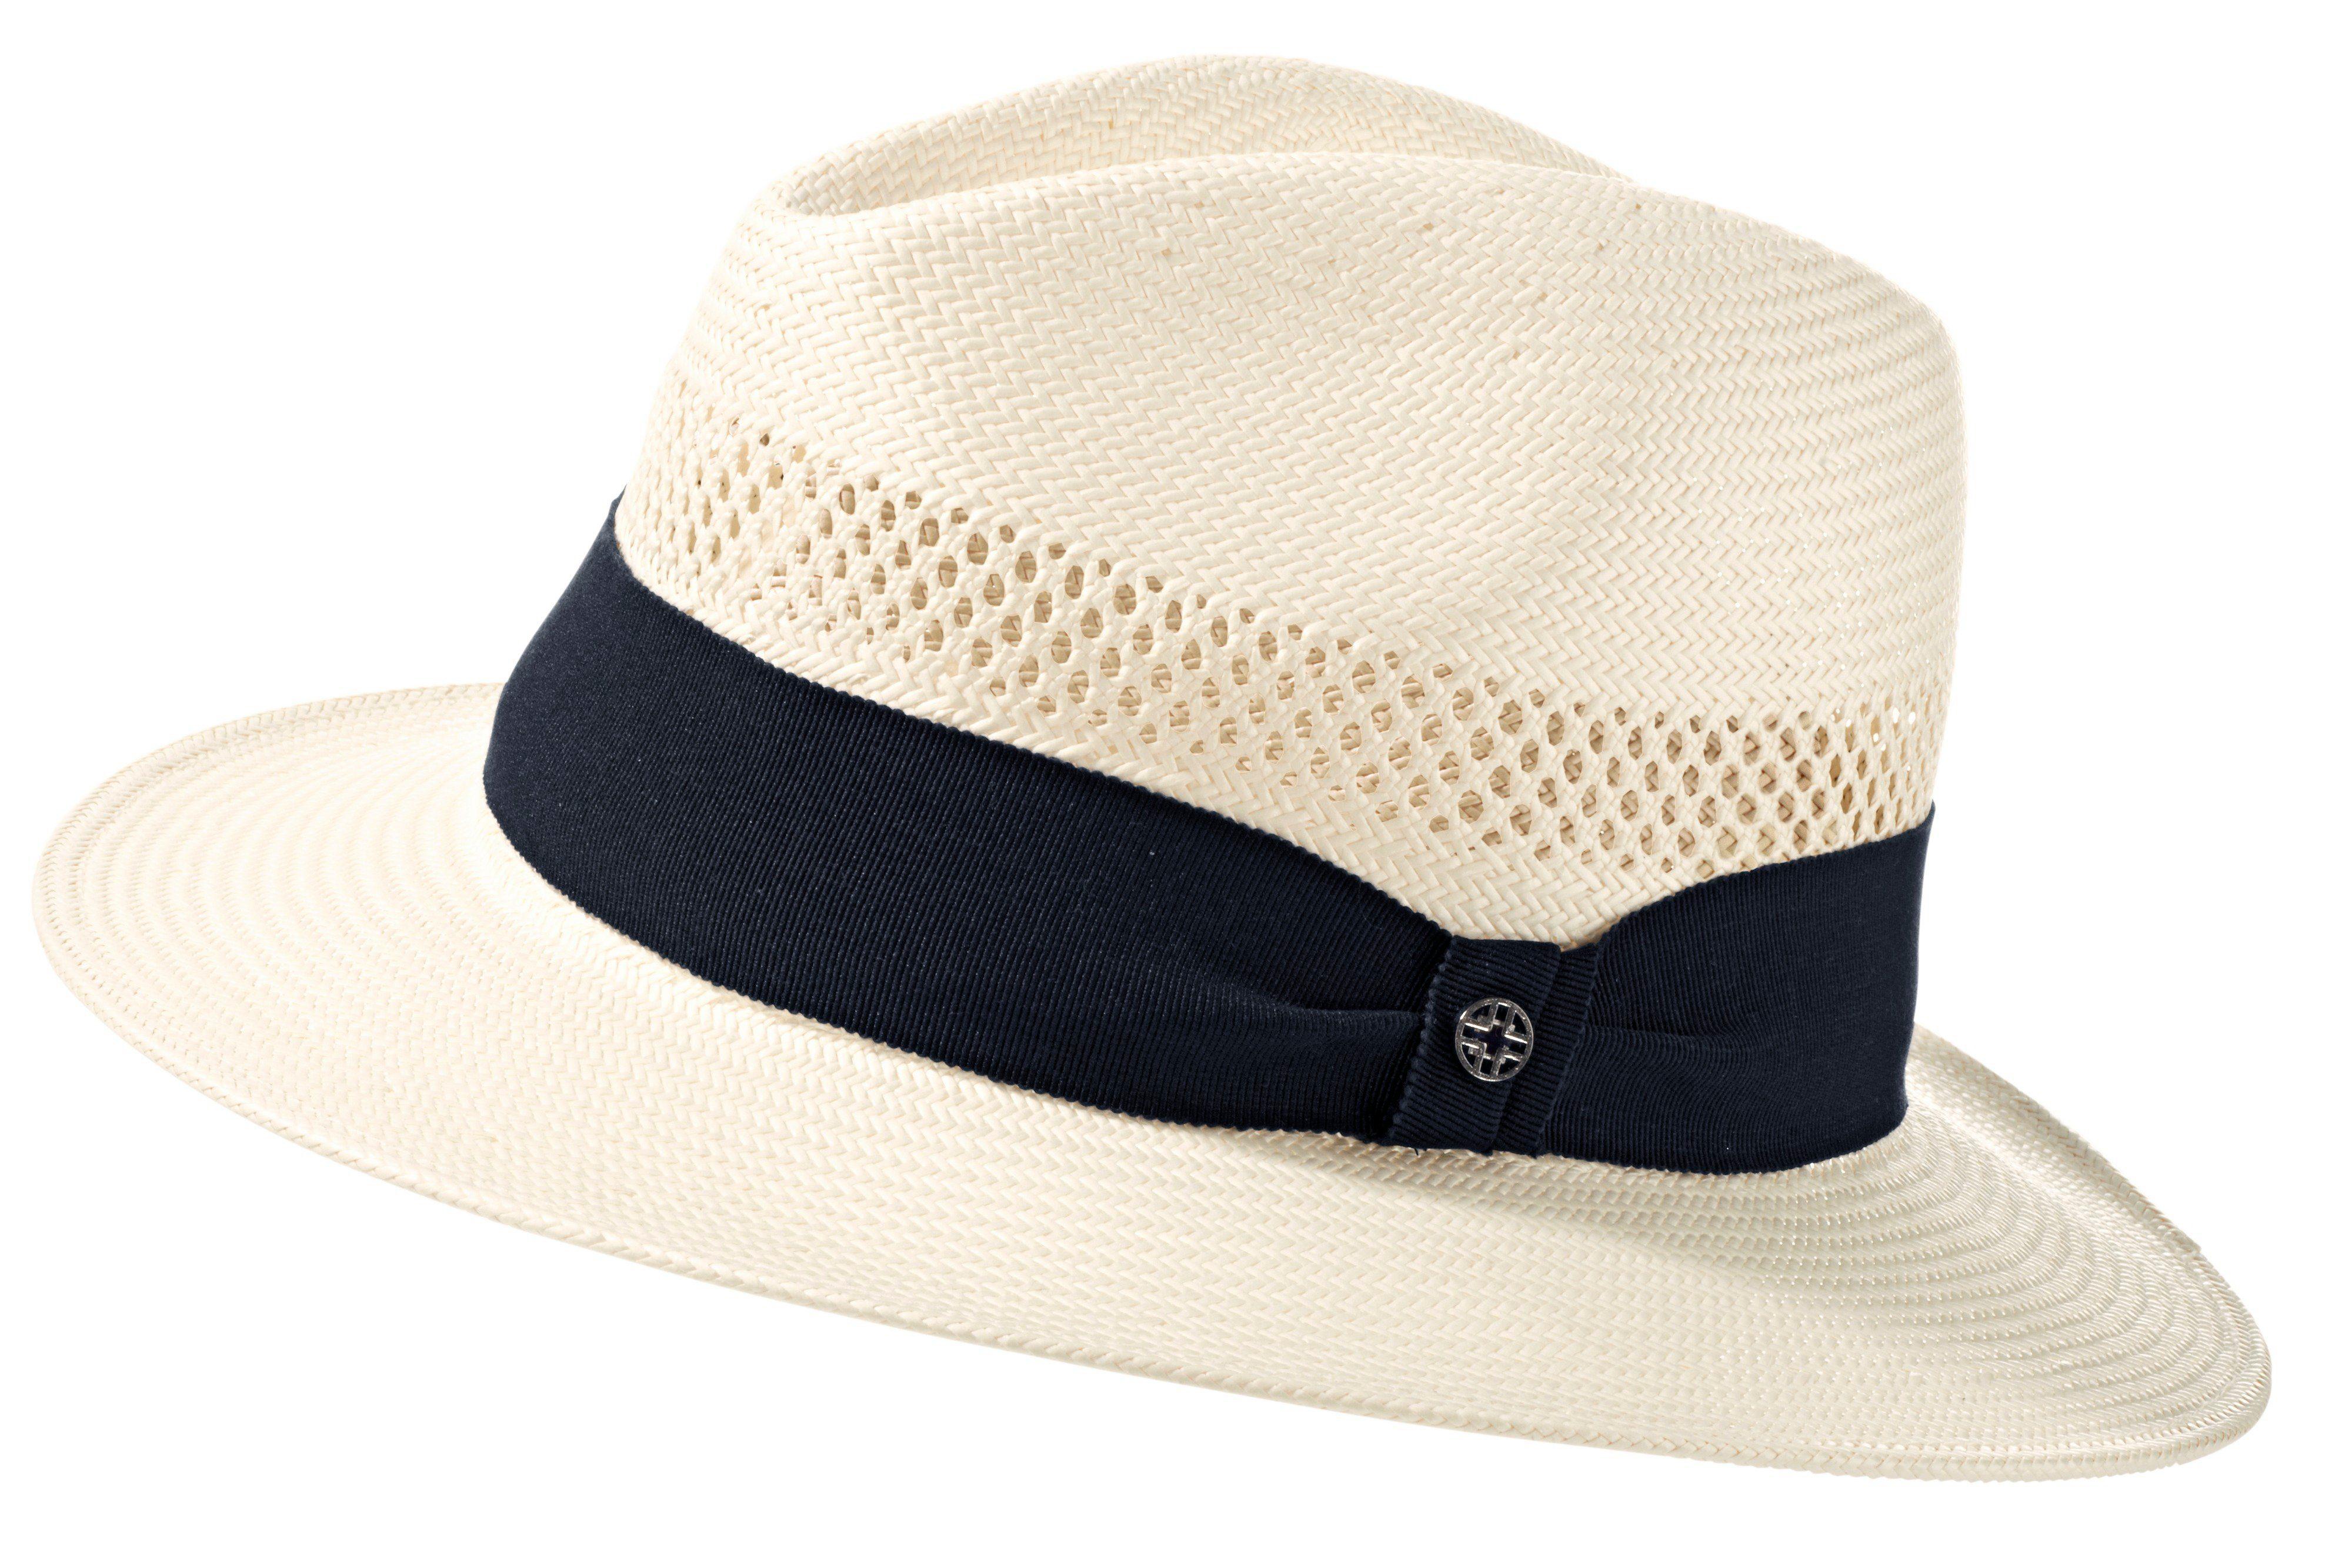 Loevenich Hut mit Lochmuster